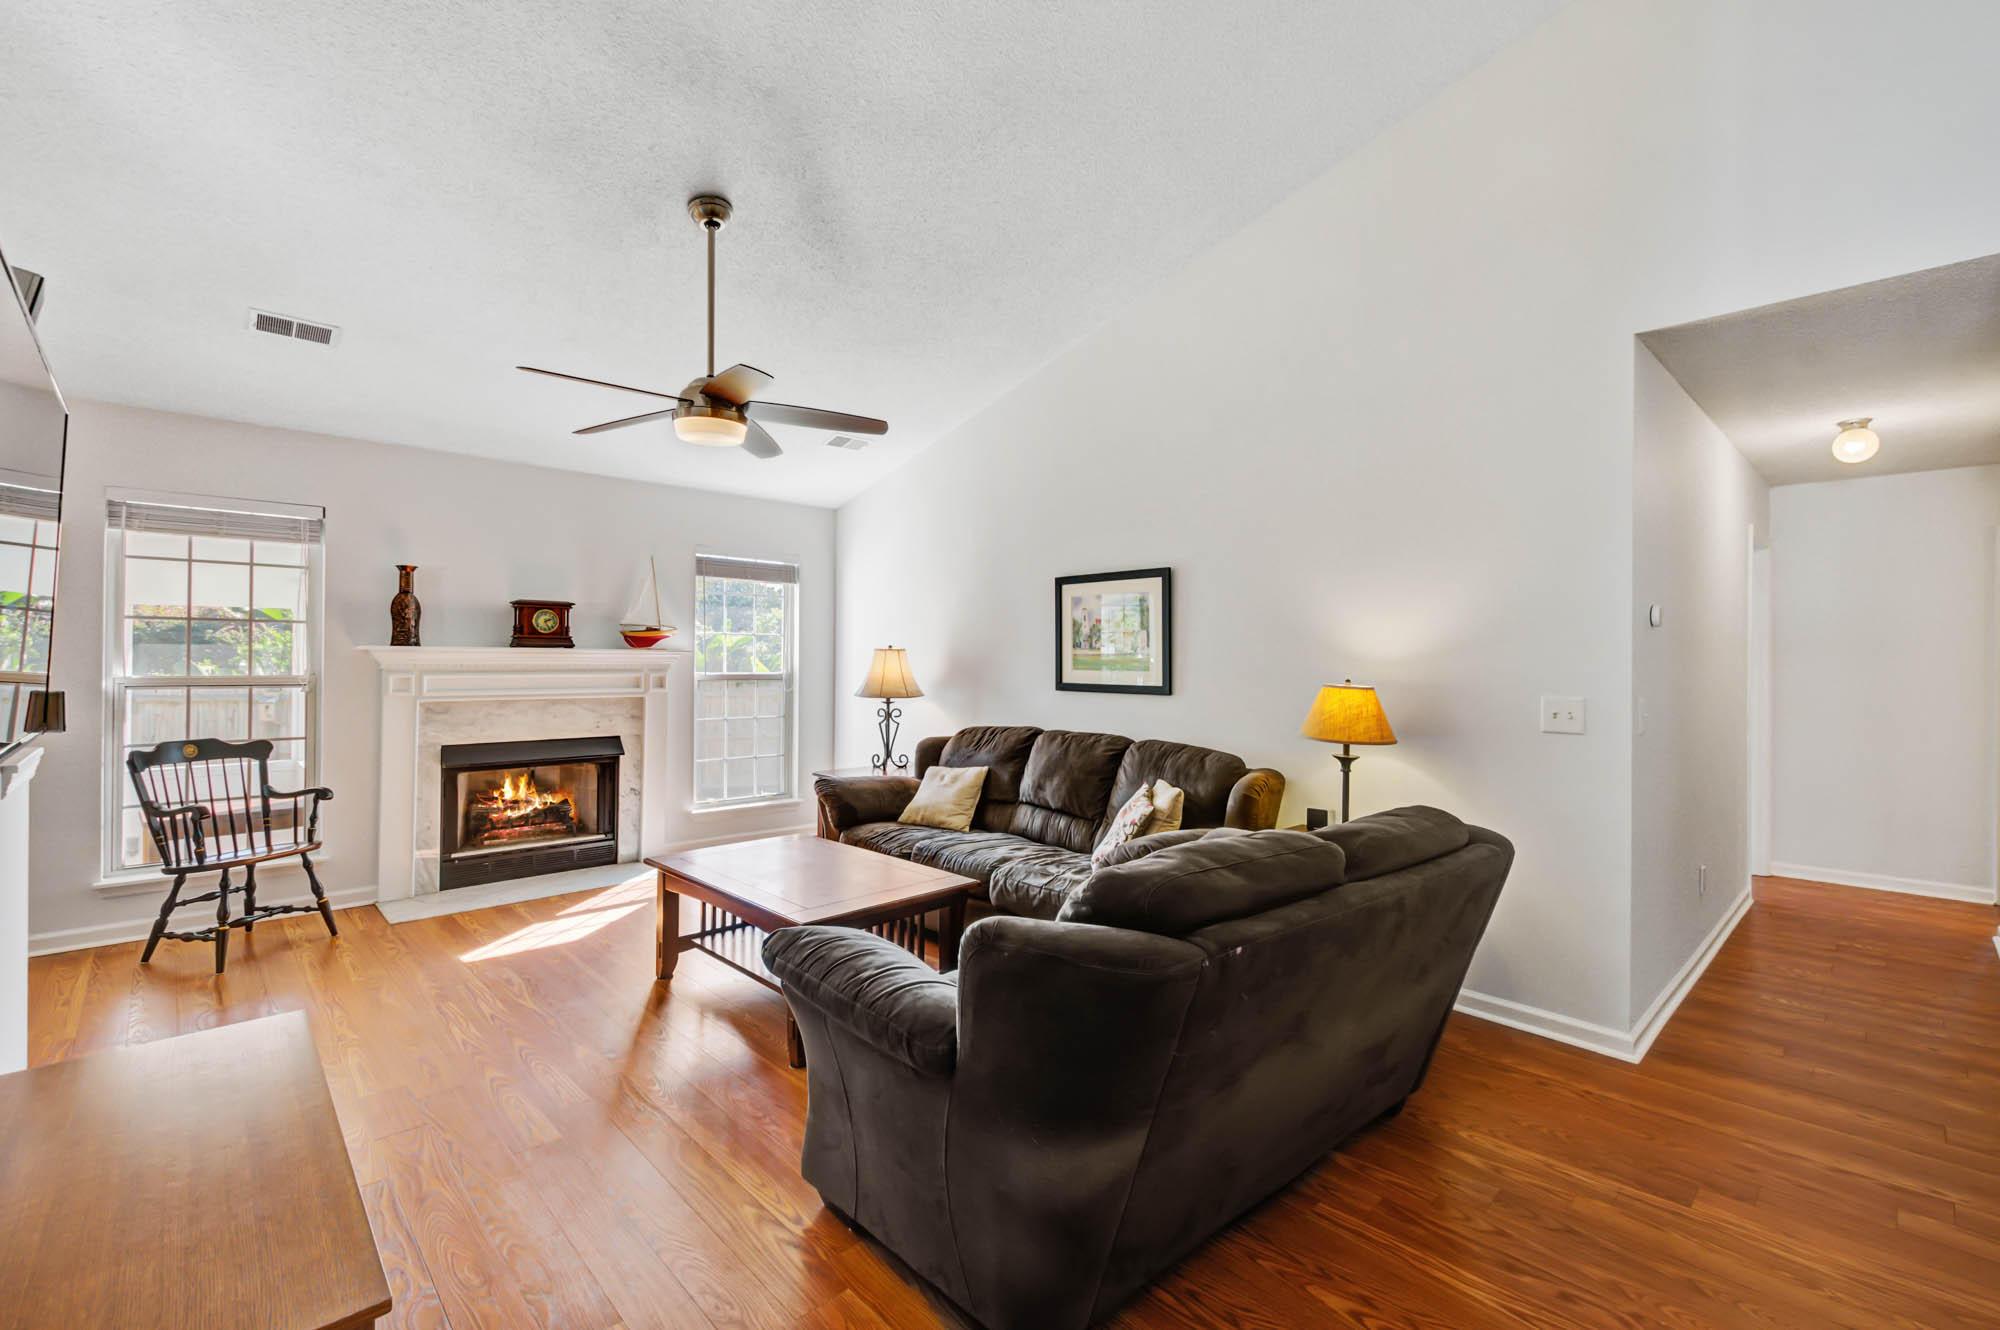 Glen Lake Homes For Sale - 728 Veron, Mount Pleasant, SC - 18